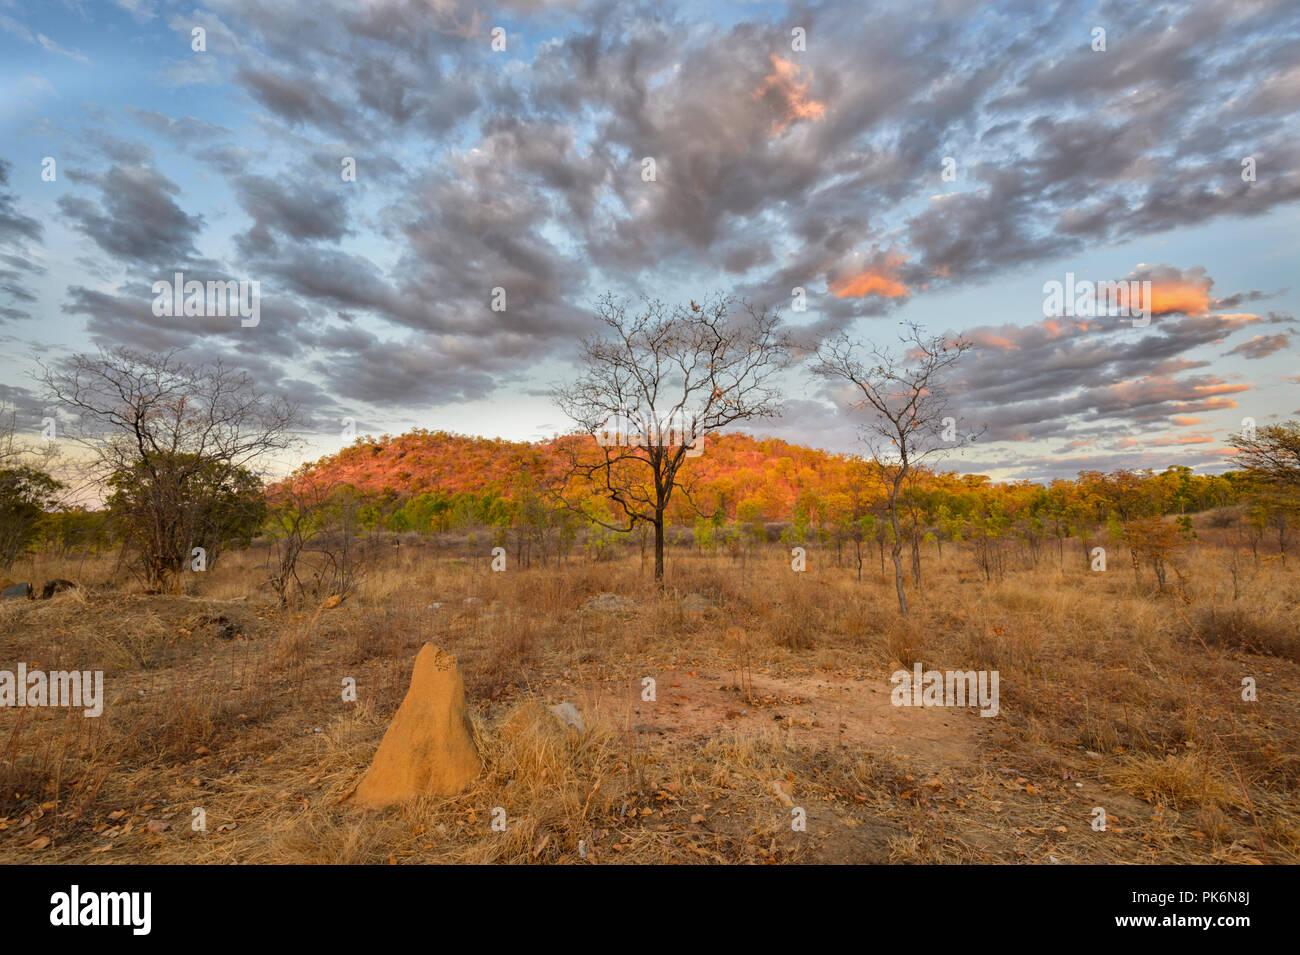 Amanecer atmosférica en el outback en Chillagoe, Norte de Queensland, Queensland, Australia Imagen De Stock